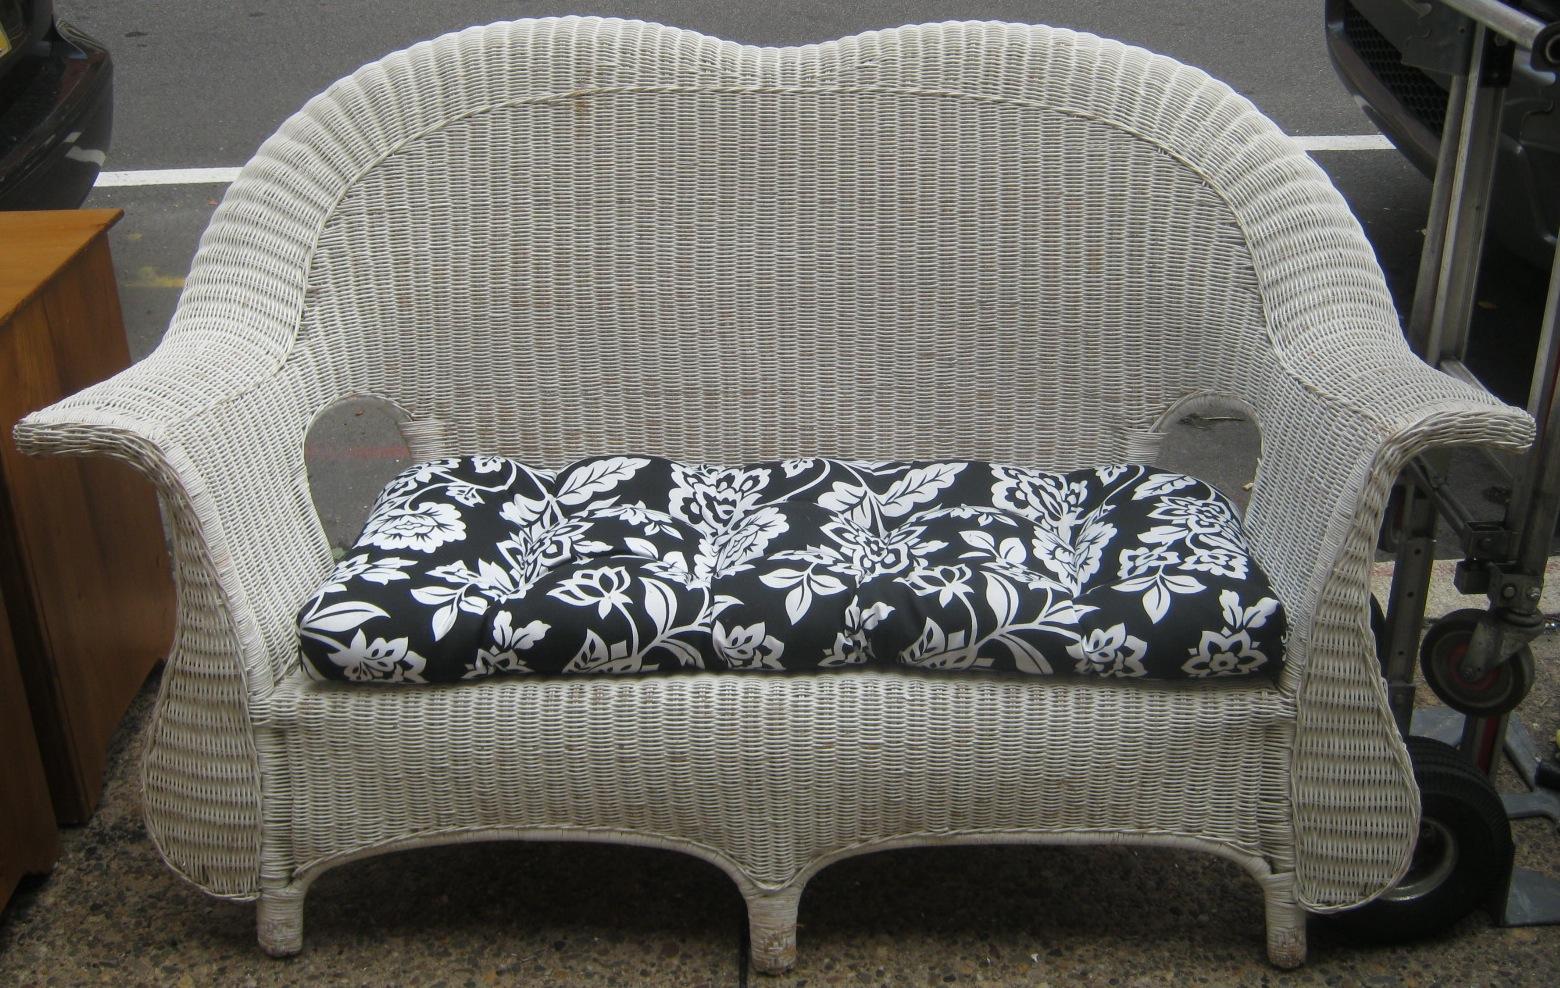 Uhuru Furniture Collectibles White Wicker Loveseat Sold